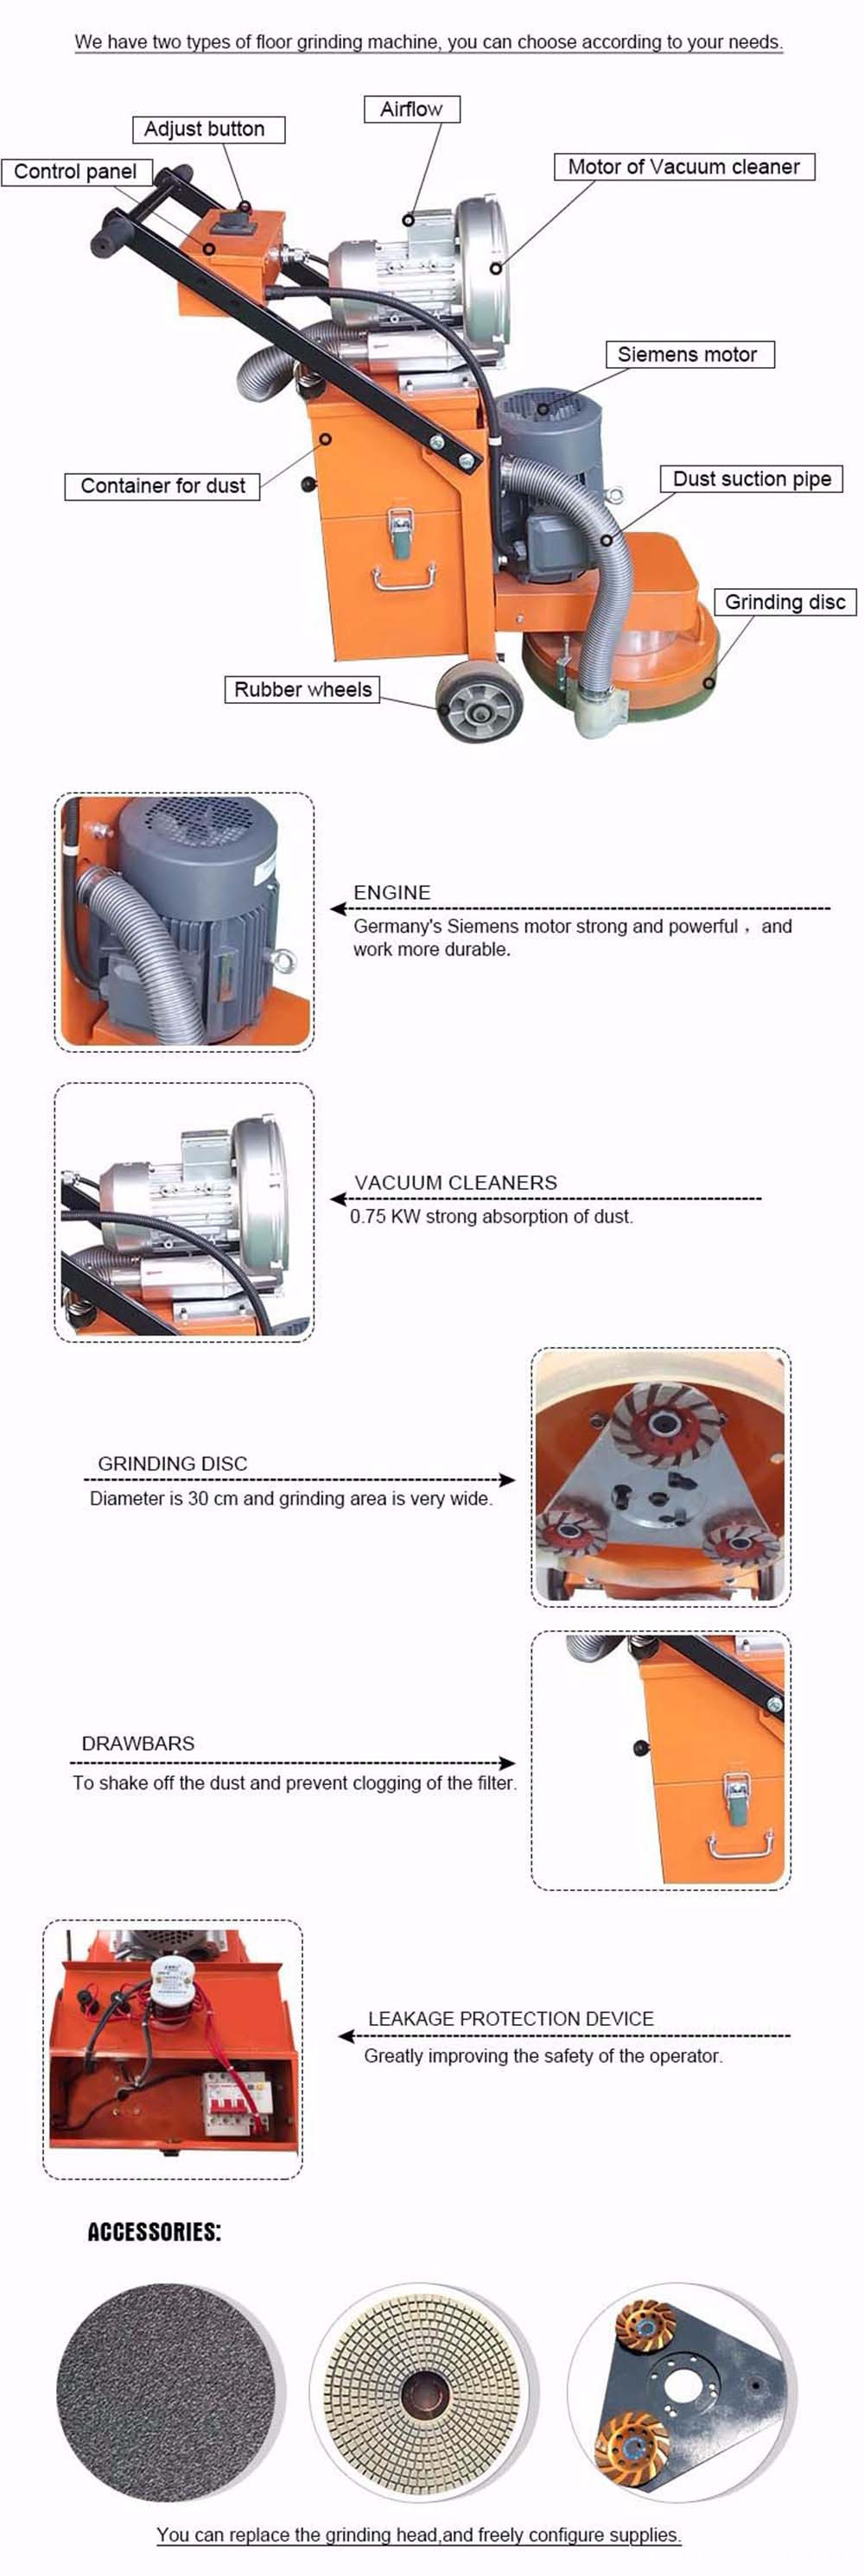 concrete polishing machine details show